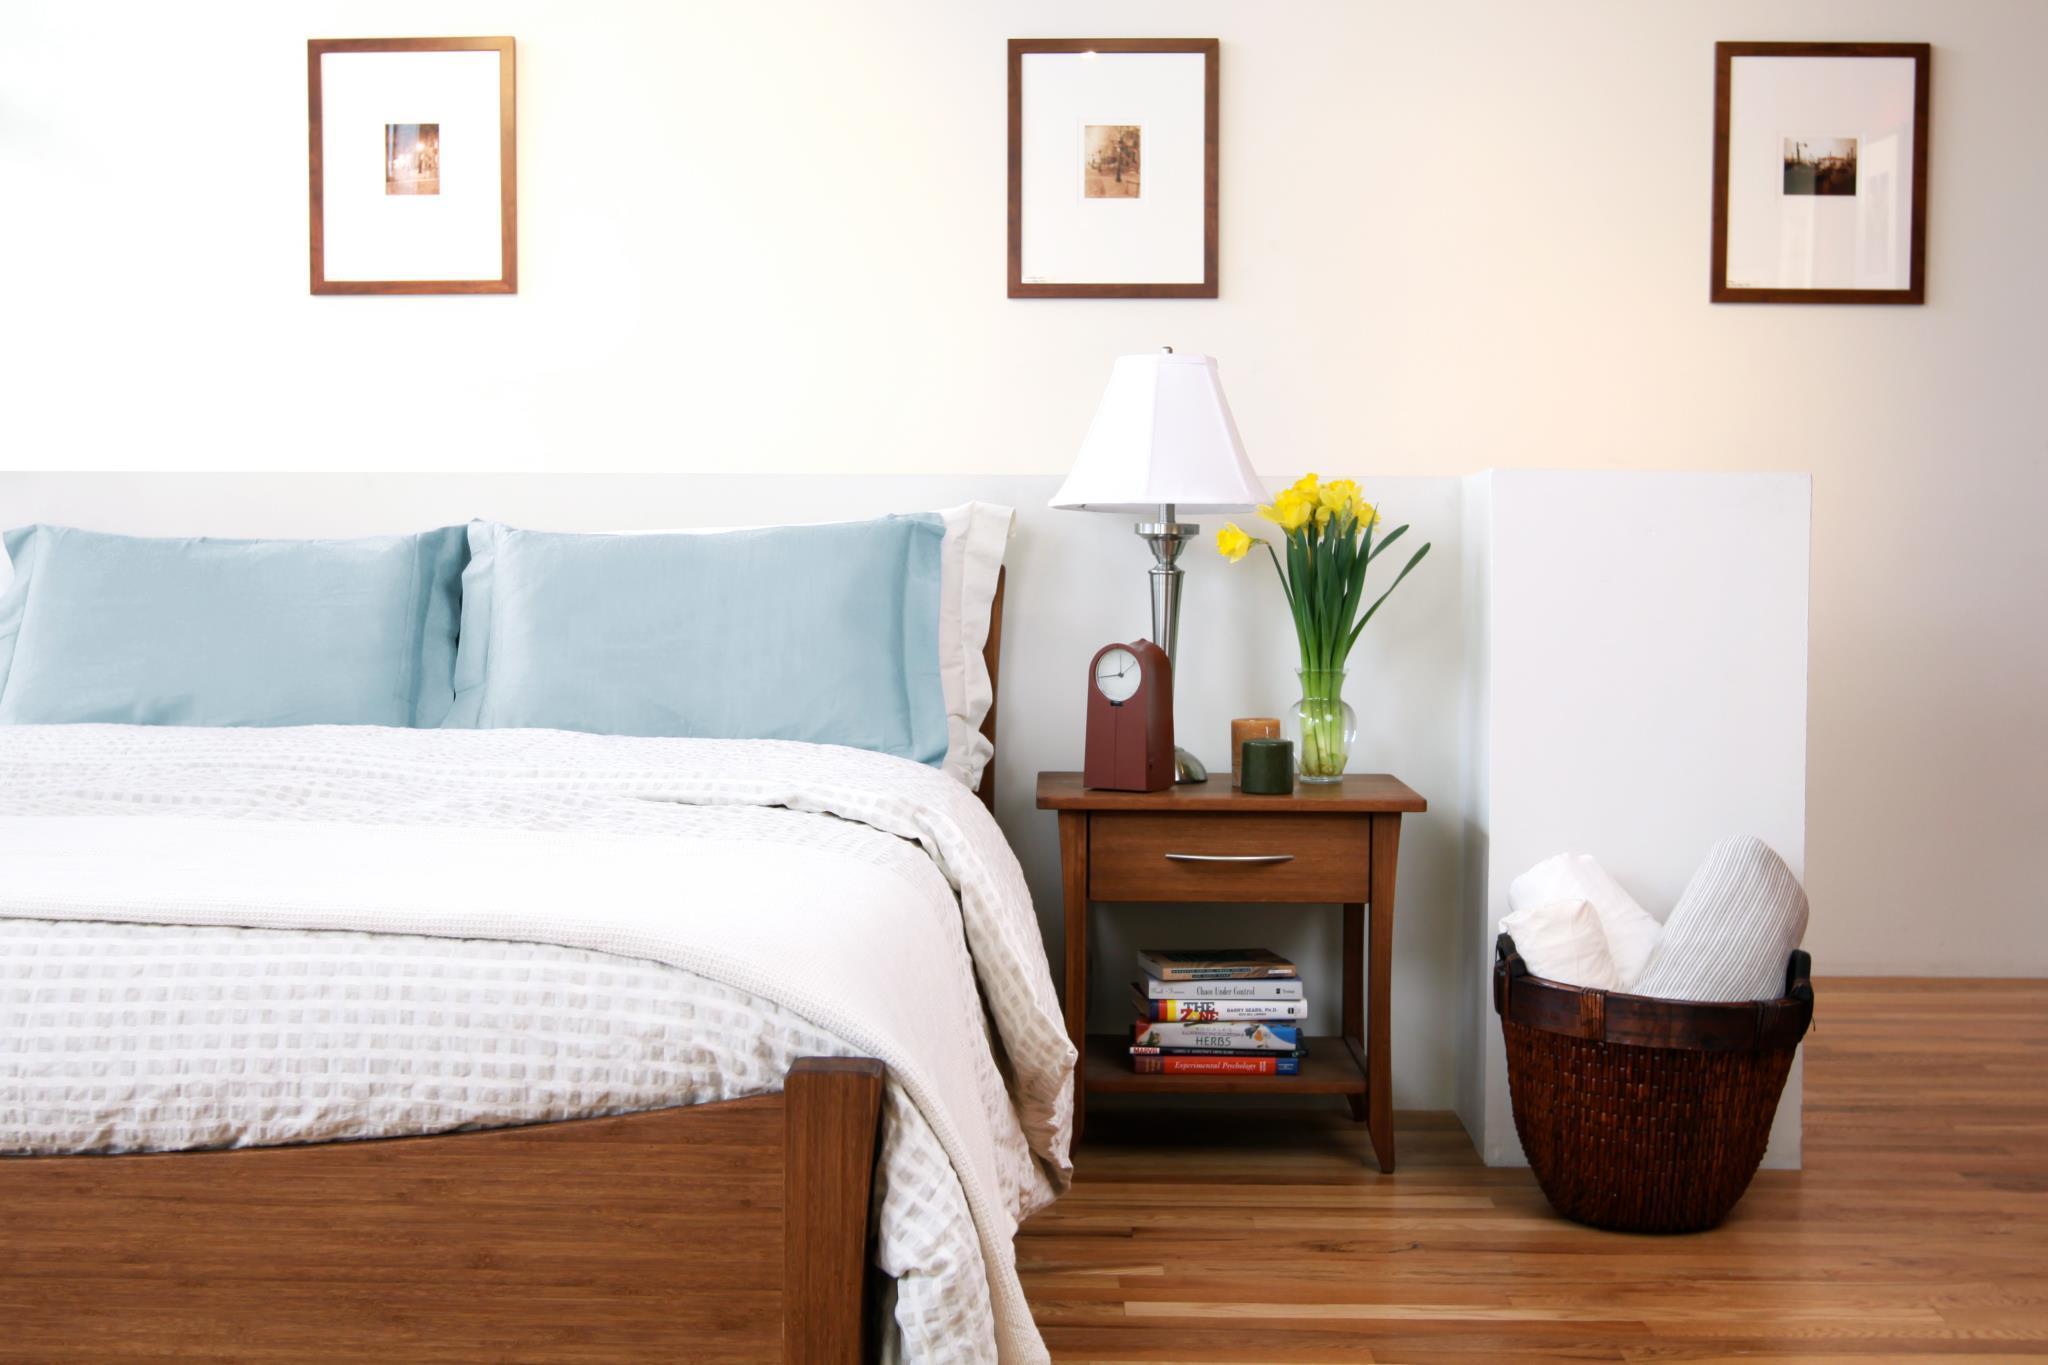 The Natural Sleep Store – Natural Talalay Latex Mattress And Latex Pillow Store In Denver Colorado